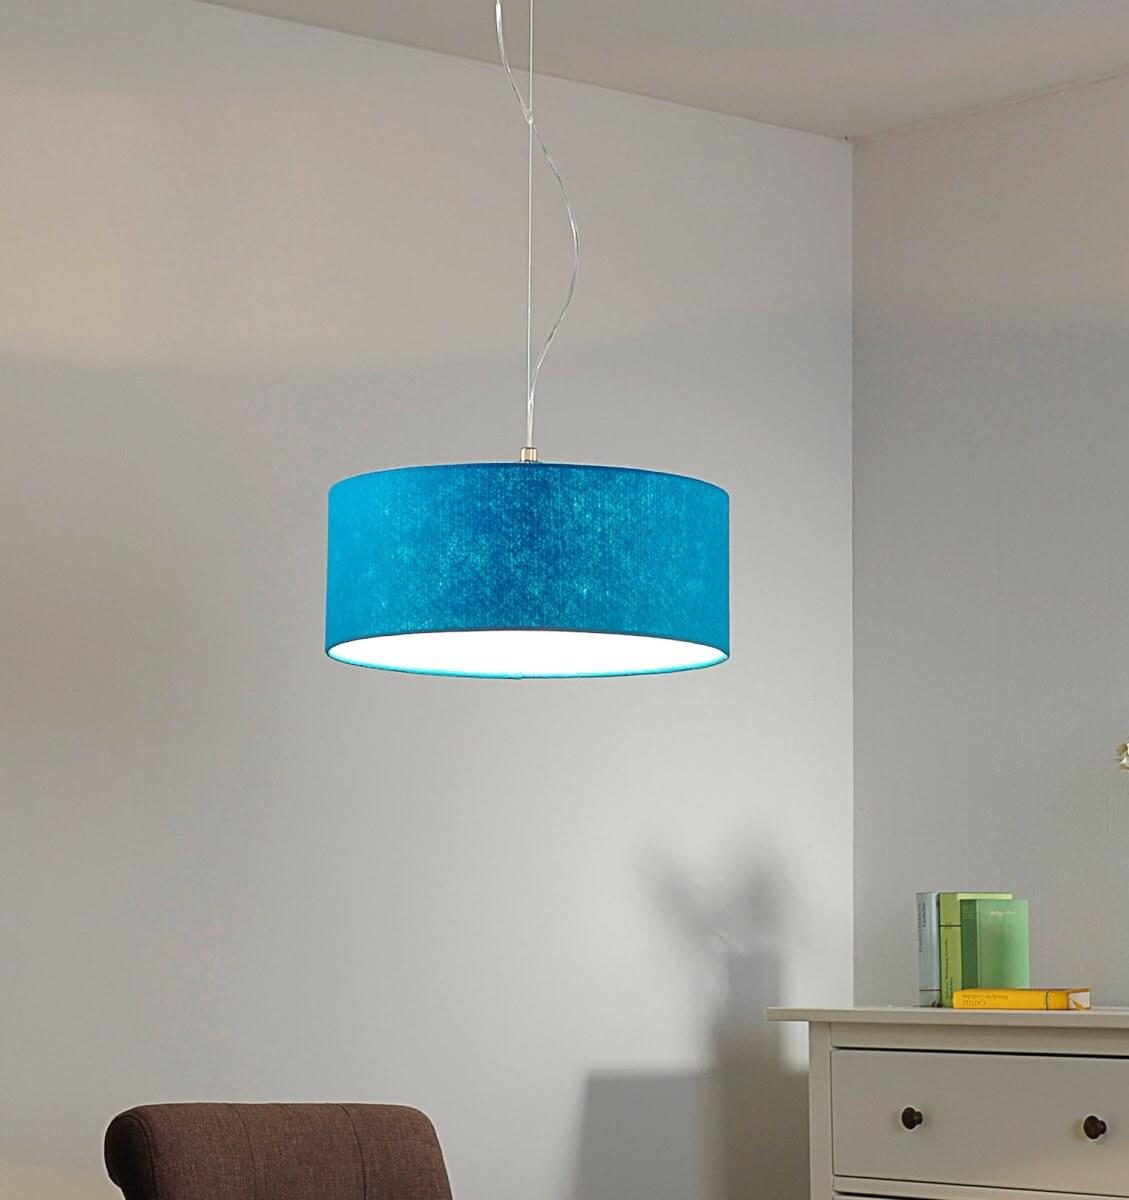 Blauwe vilten hanglamp